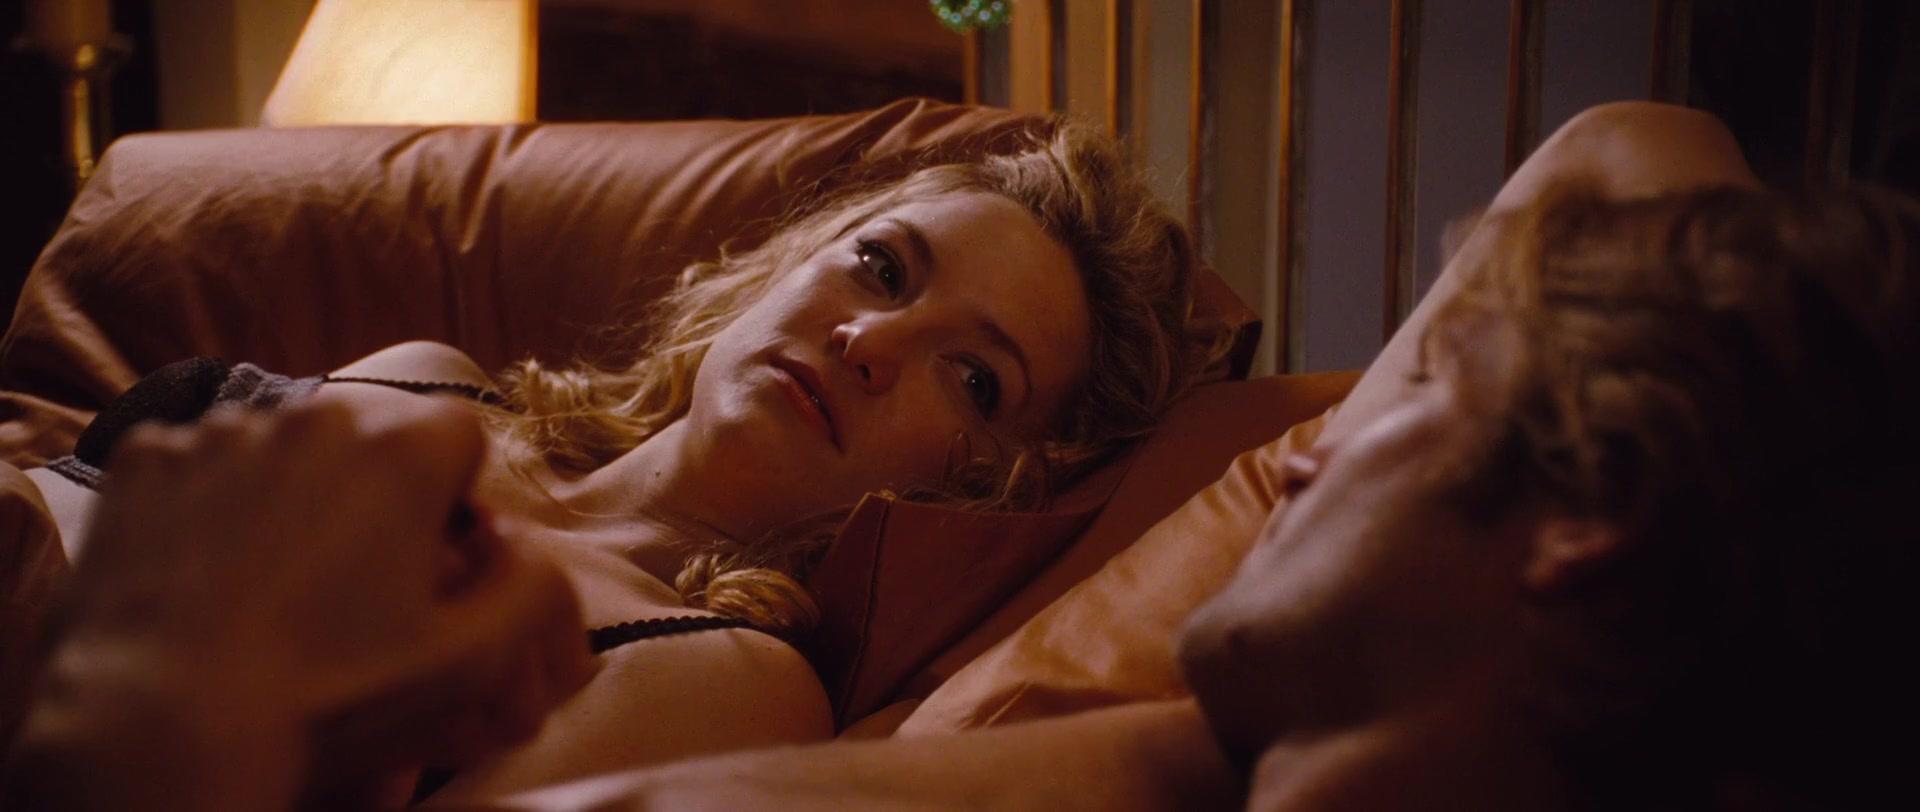 Angela Hudson Nude kate hudson - a little bit of heaven (2012) video » best